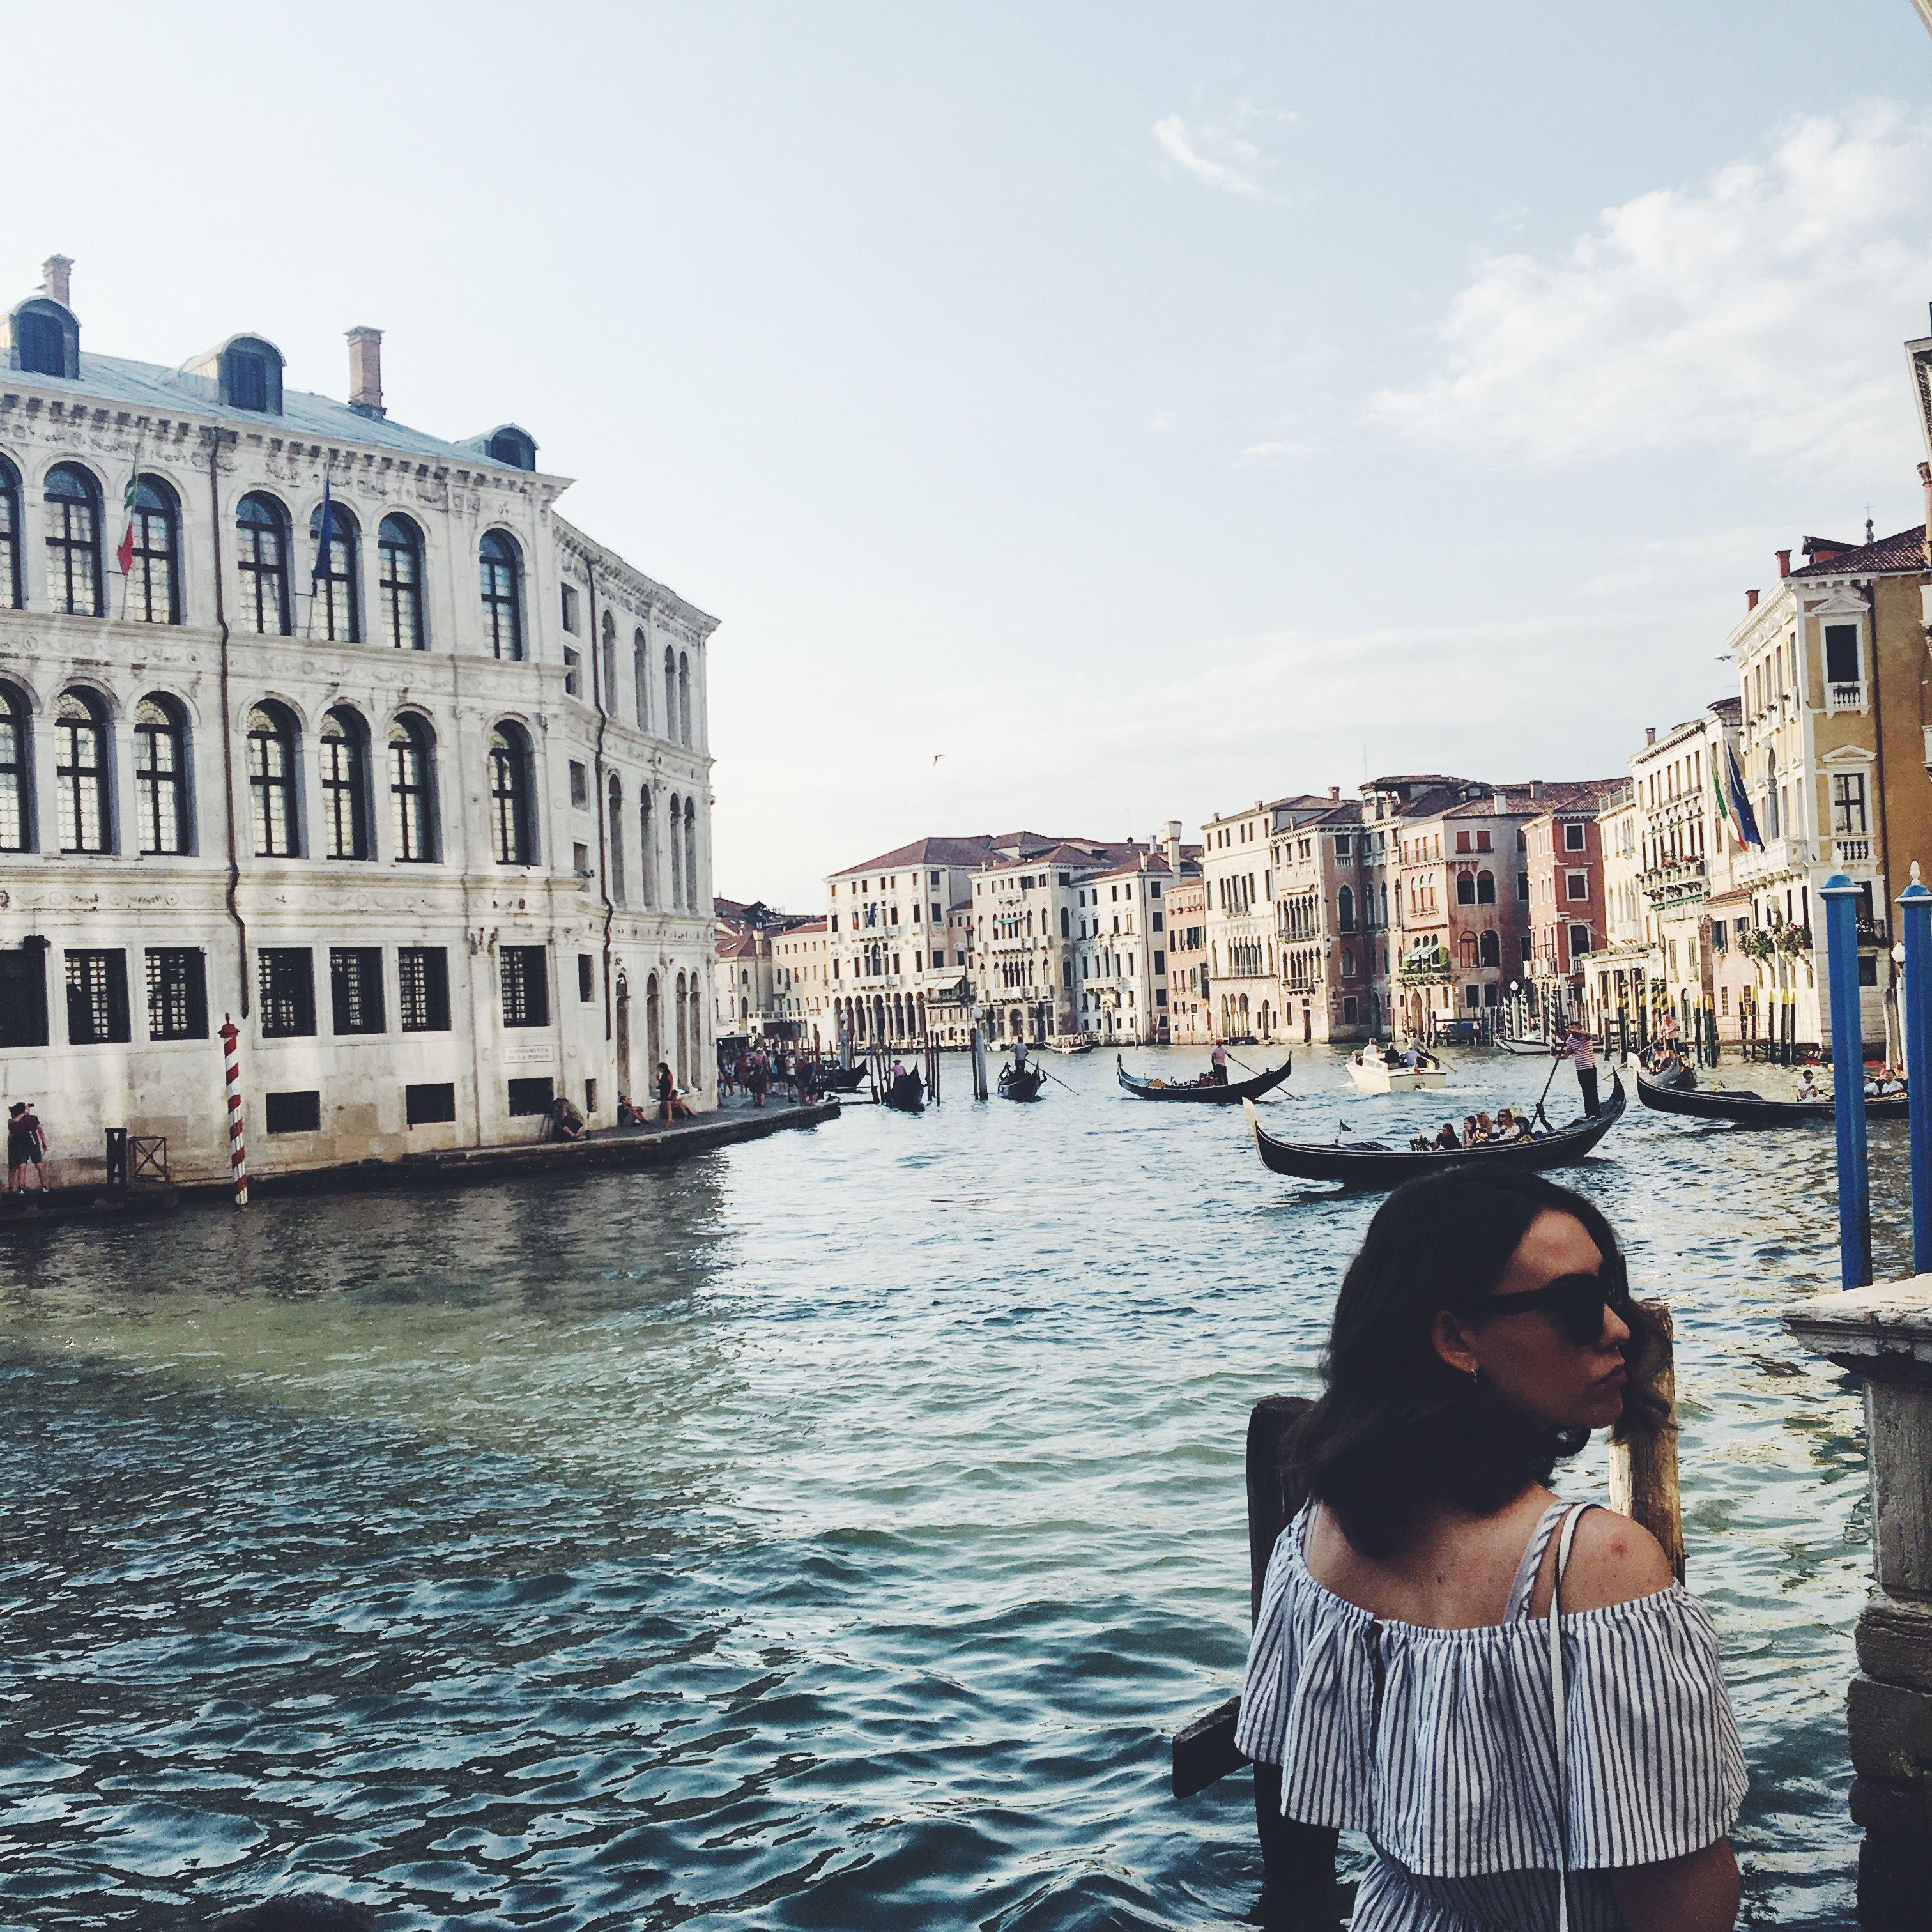 Venice, Italy @nicchdt